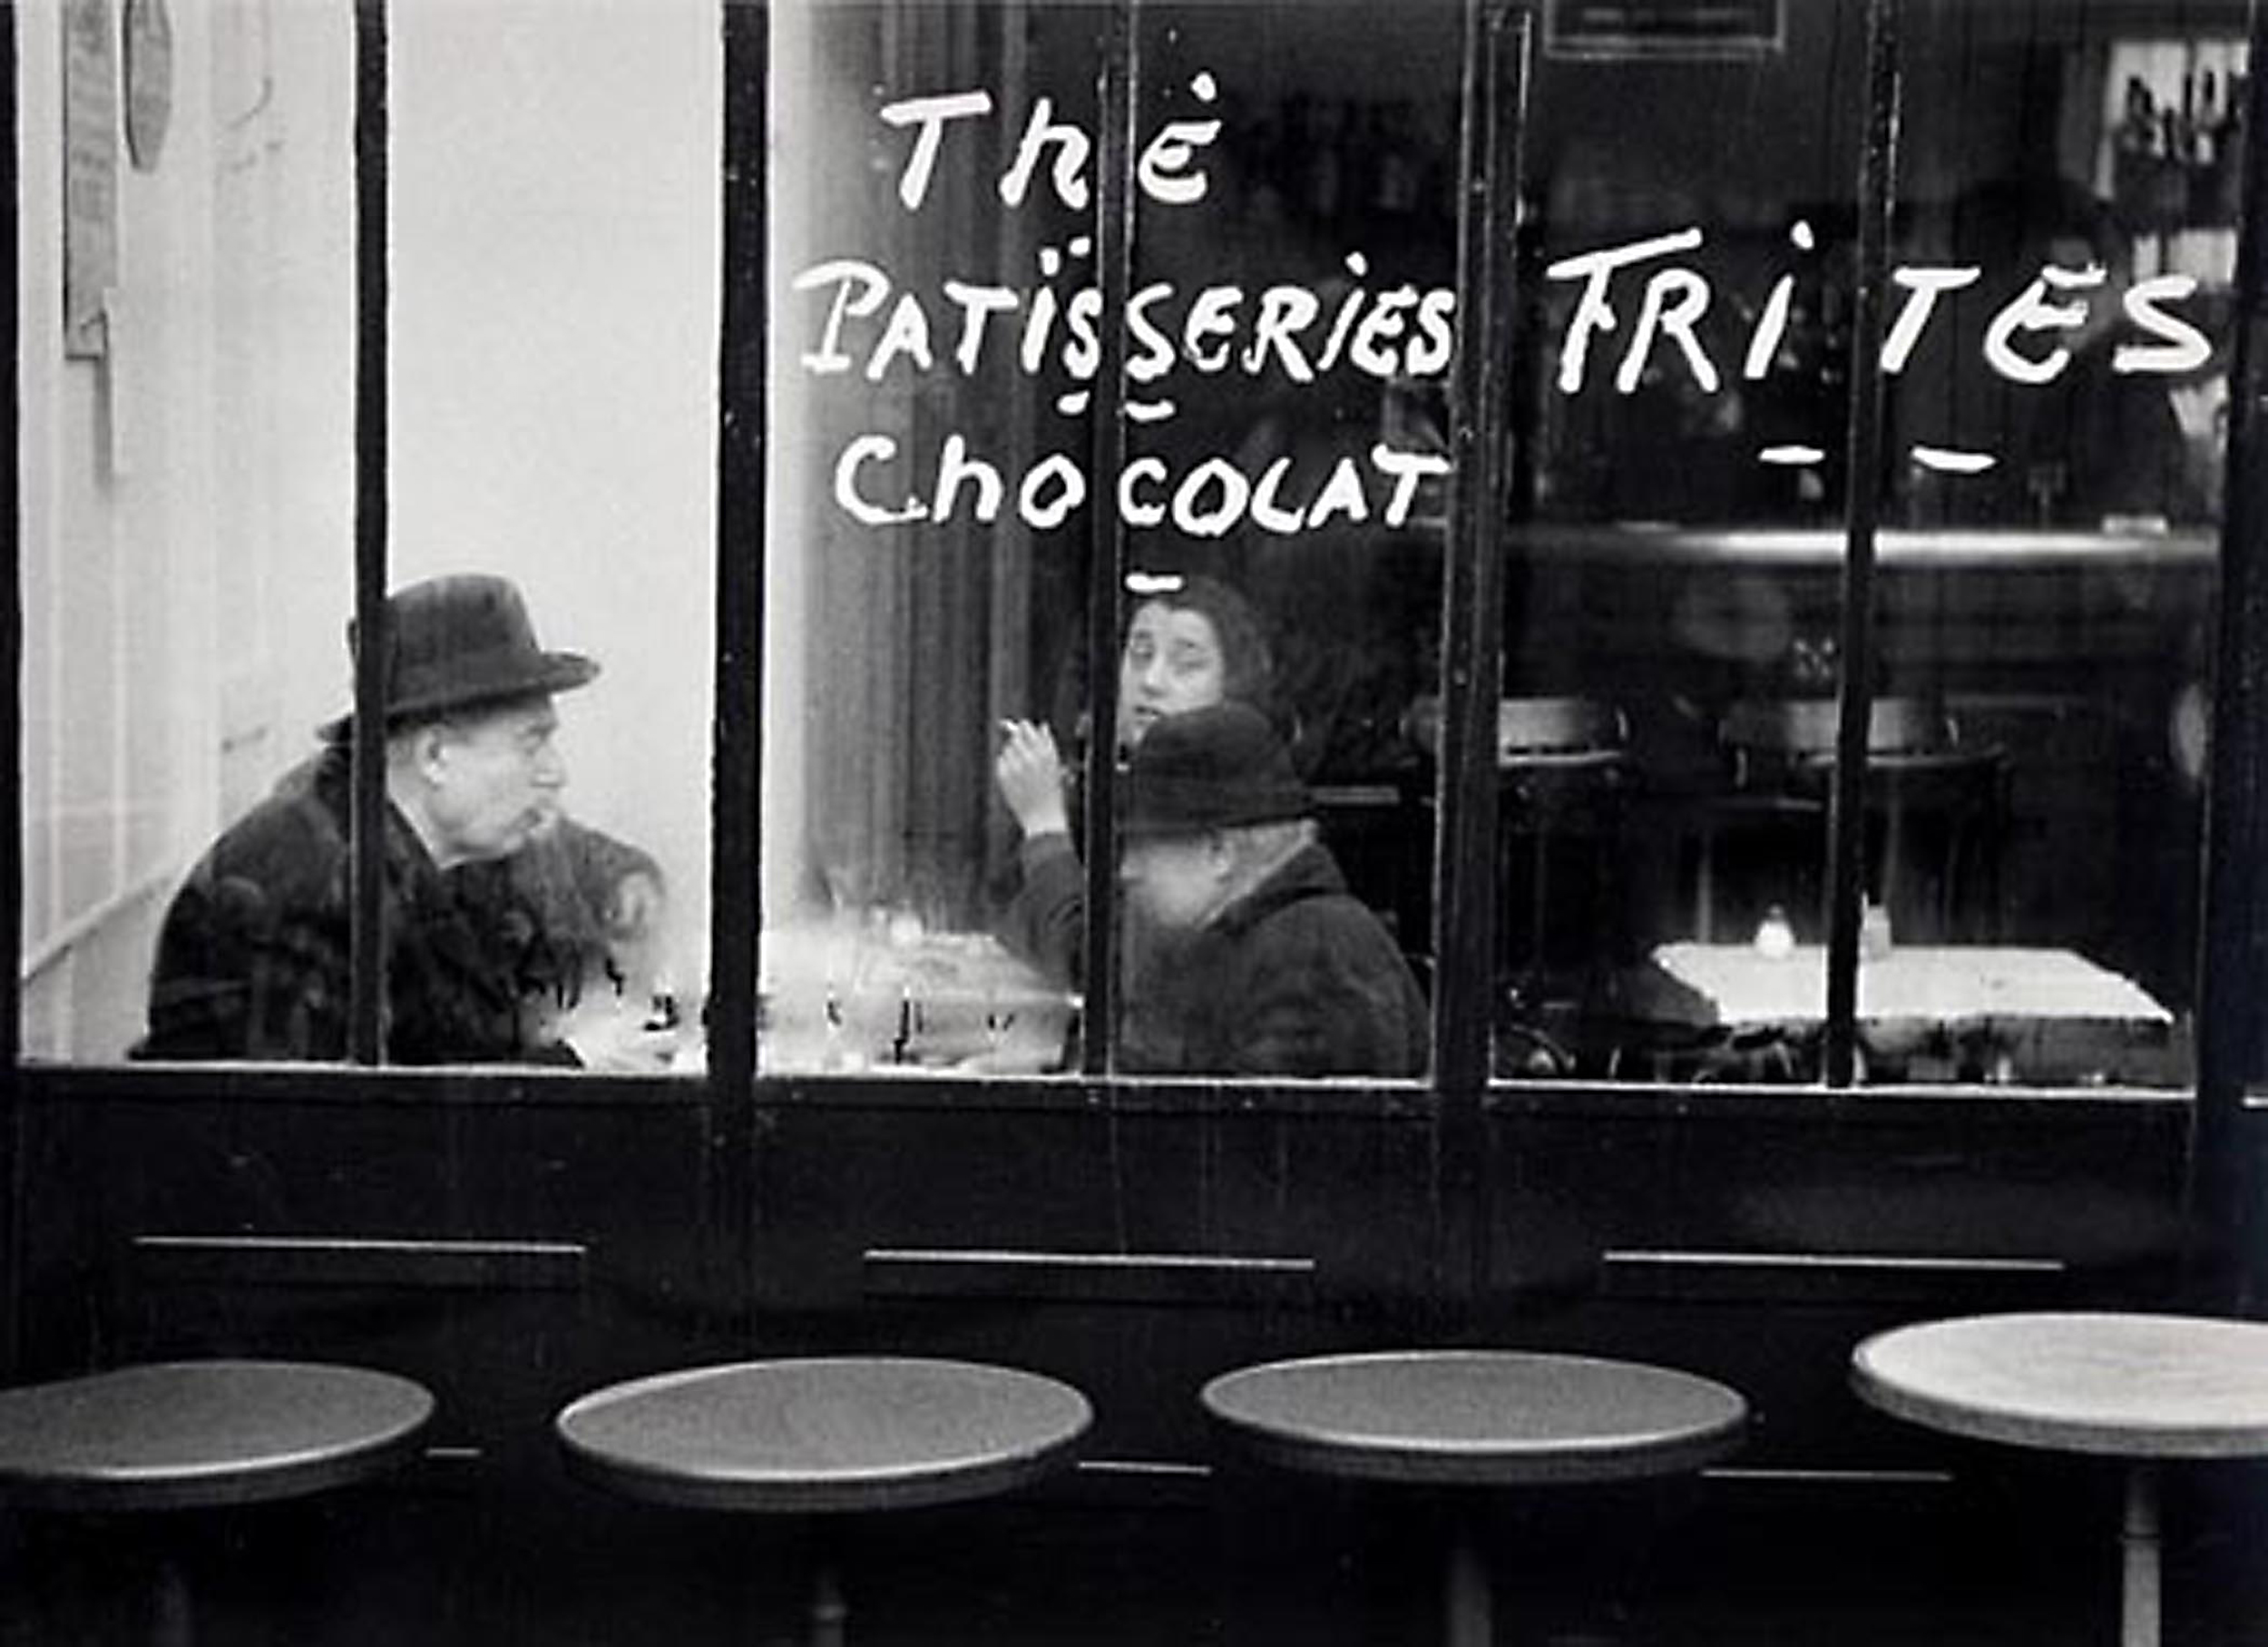 HANNON_tables_outside_restaurant_(paris)_1955_11x14_high.jpg